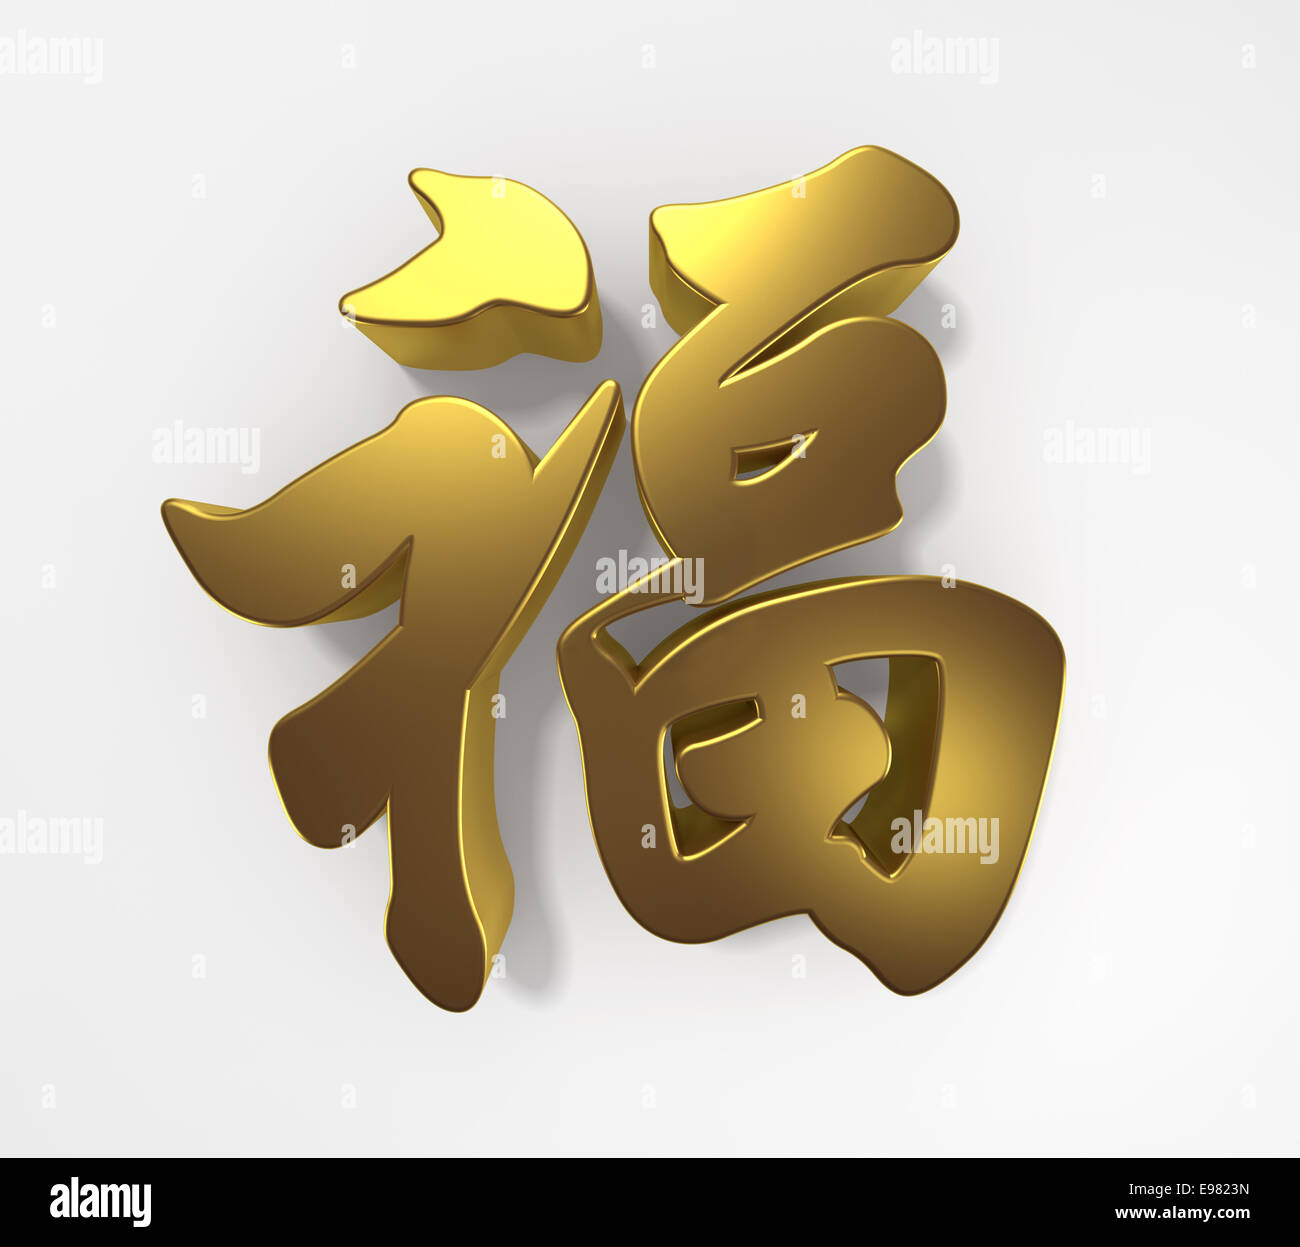 Chinese Character Symbol Stock Photos Chinese Character Symbol